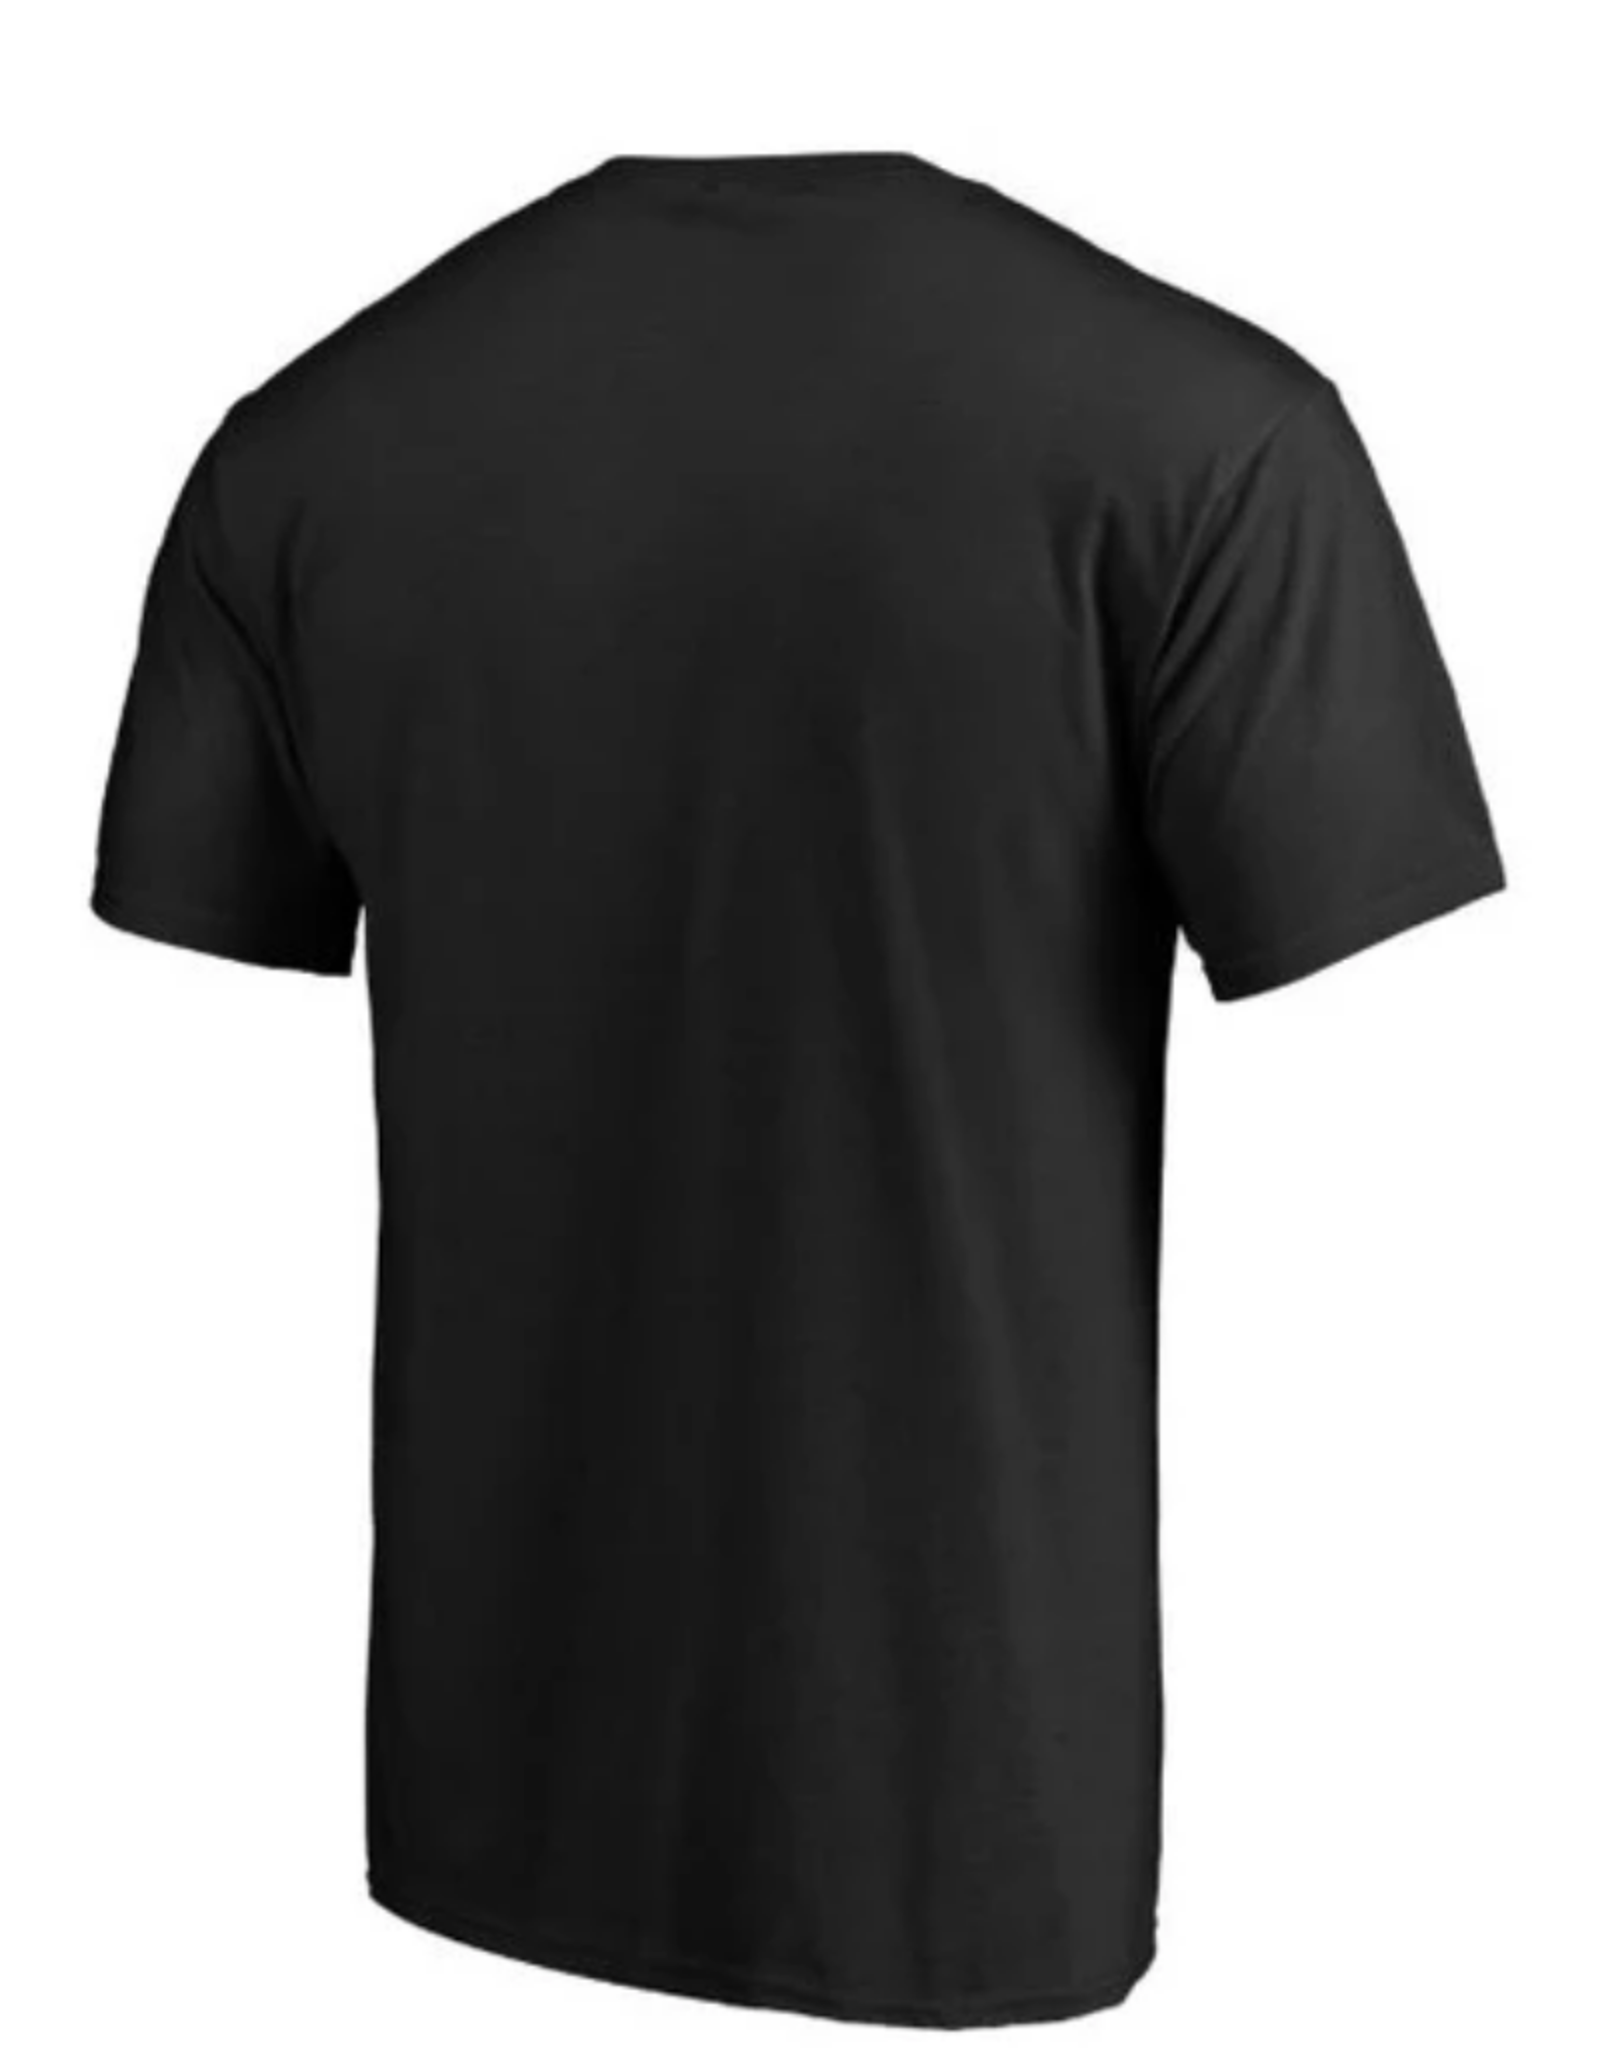 Fanatics Fanatics Men's Geo Drift T-Shirt Pittsburgh Penguins Black